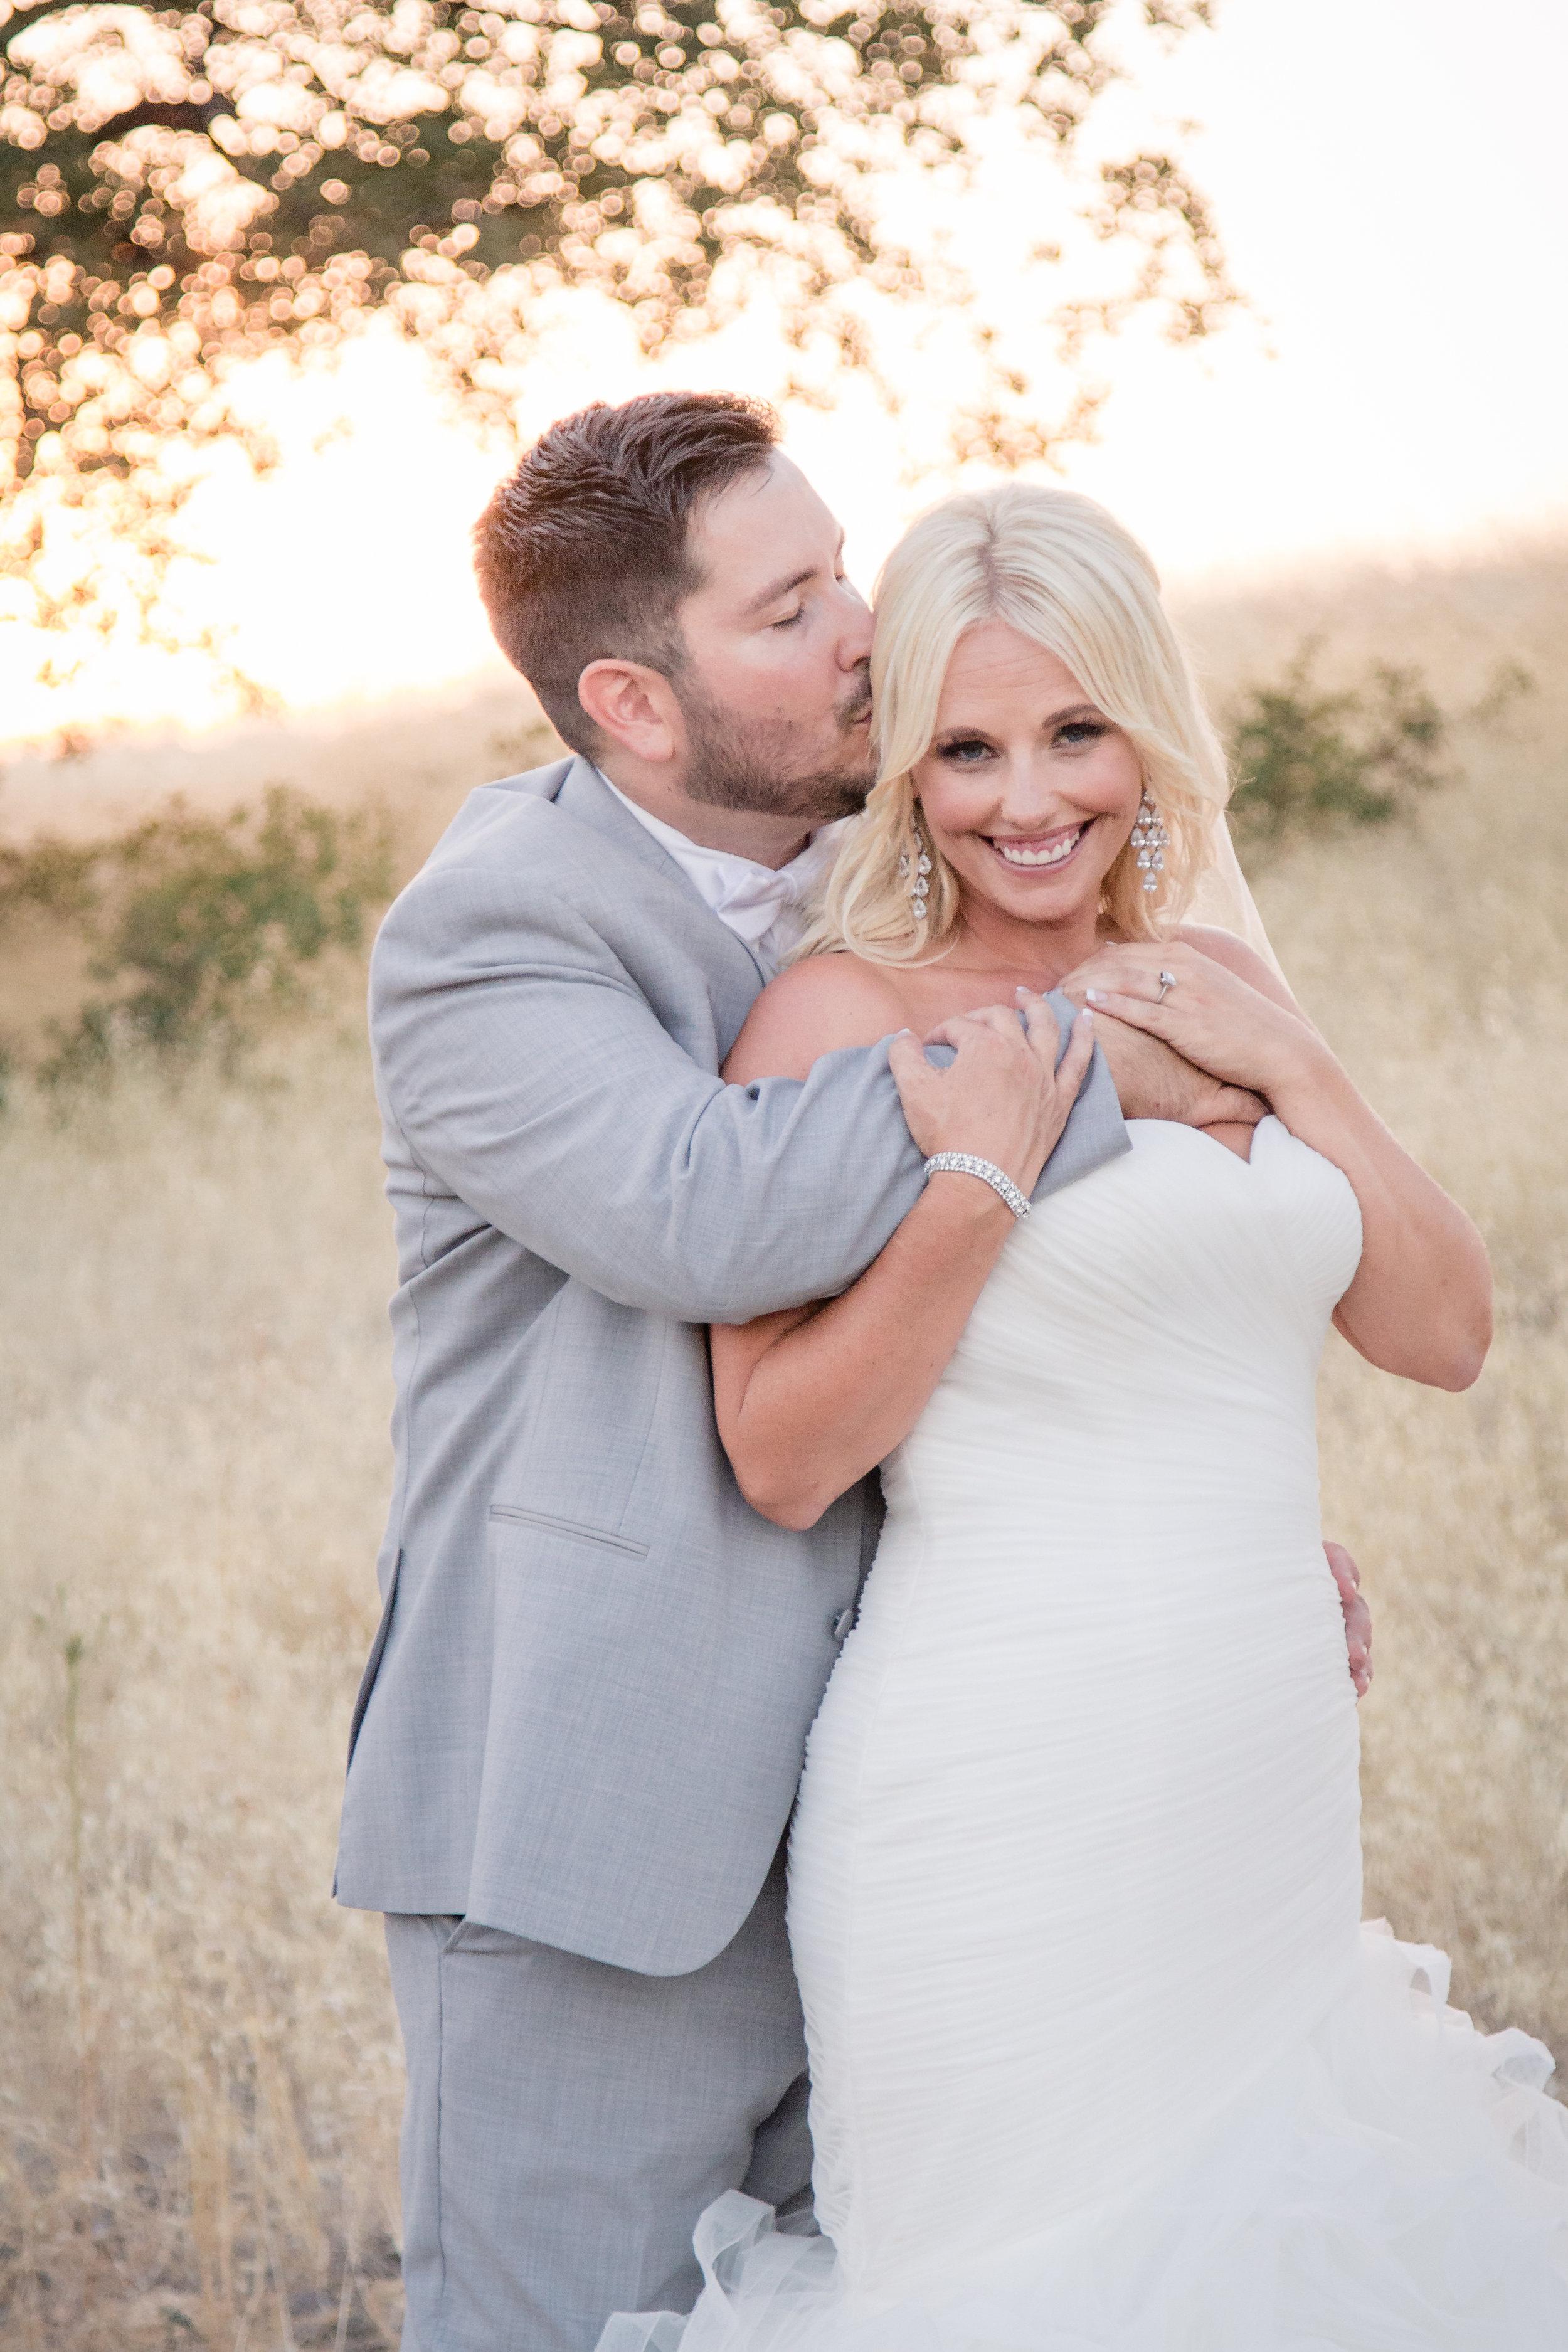 White Ranch Events - Chico - Ashley Teasley Photography - Sacramento Wedding Photographer 33.JPG